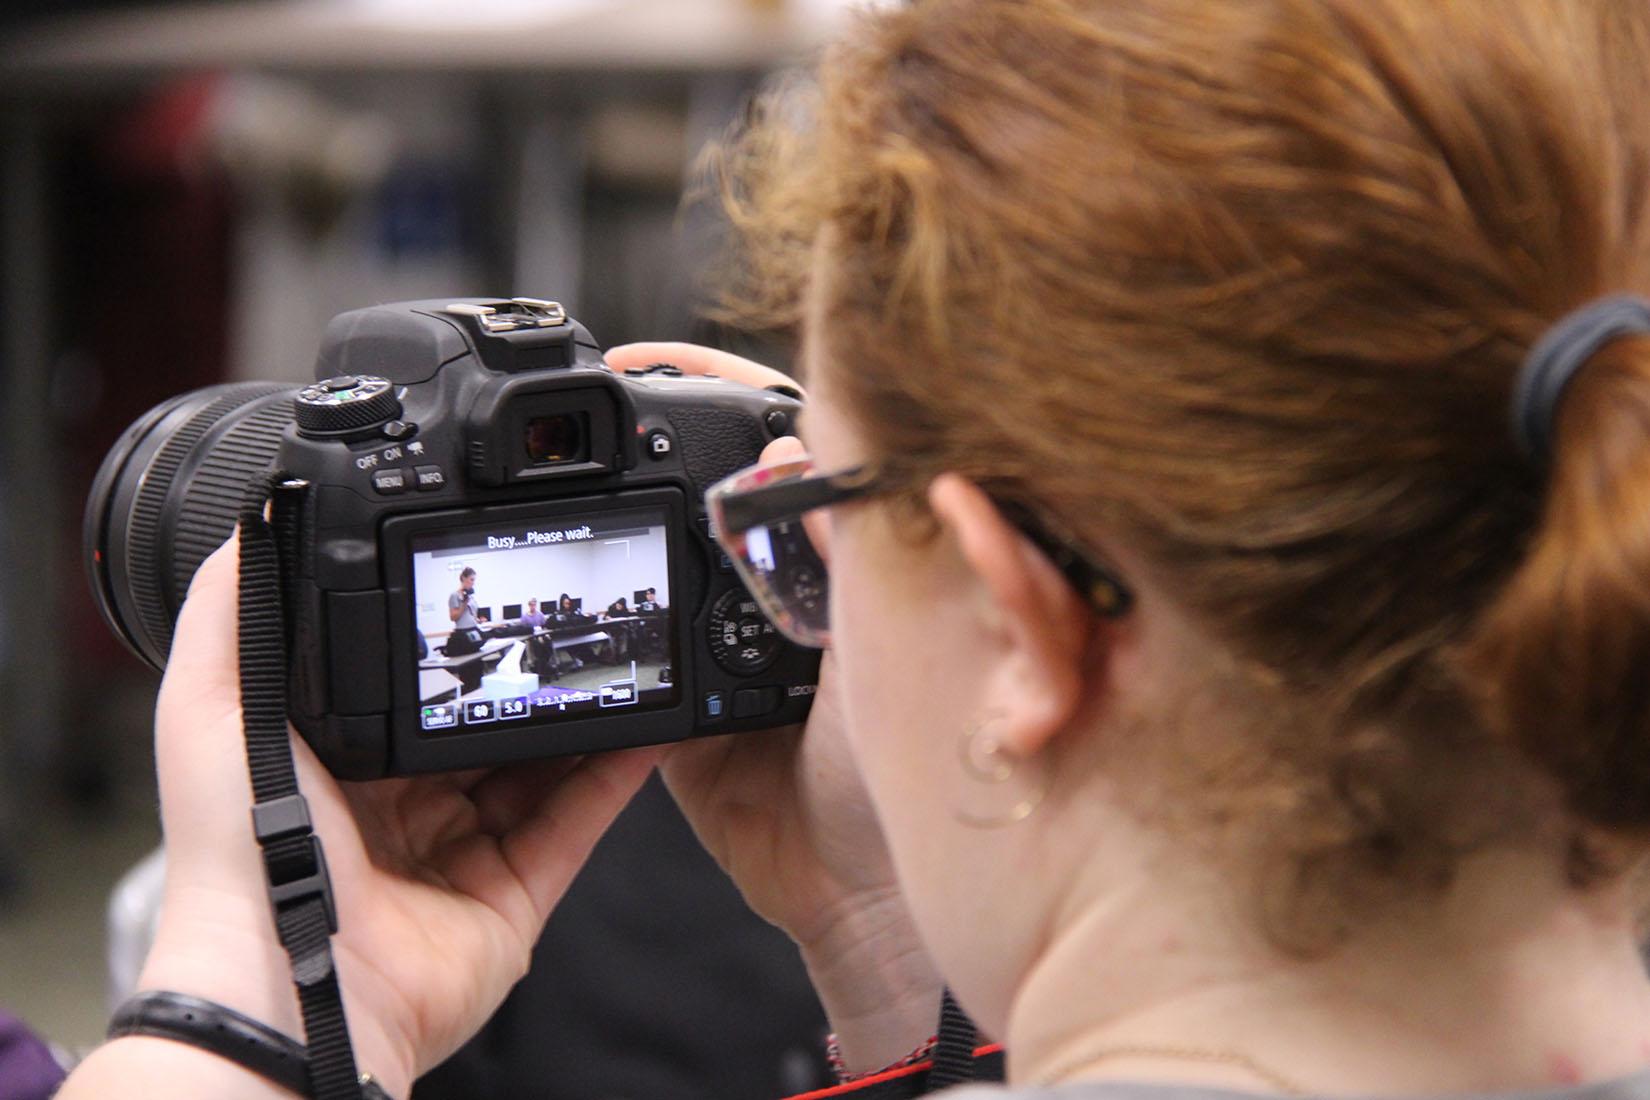 MDOCS Workshop Through the Camera Lens